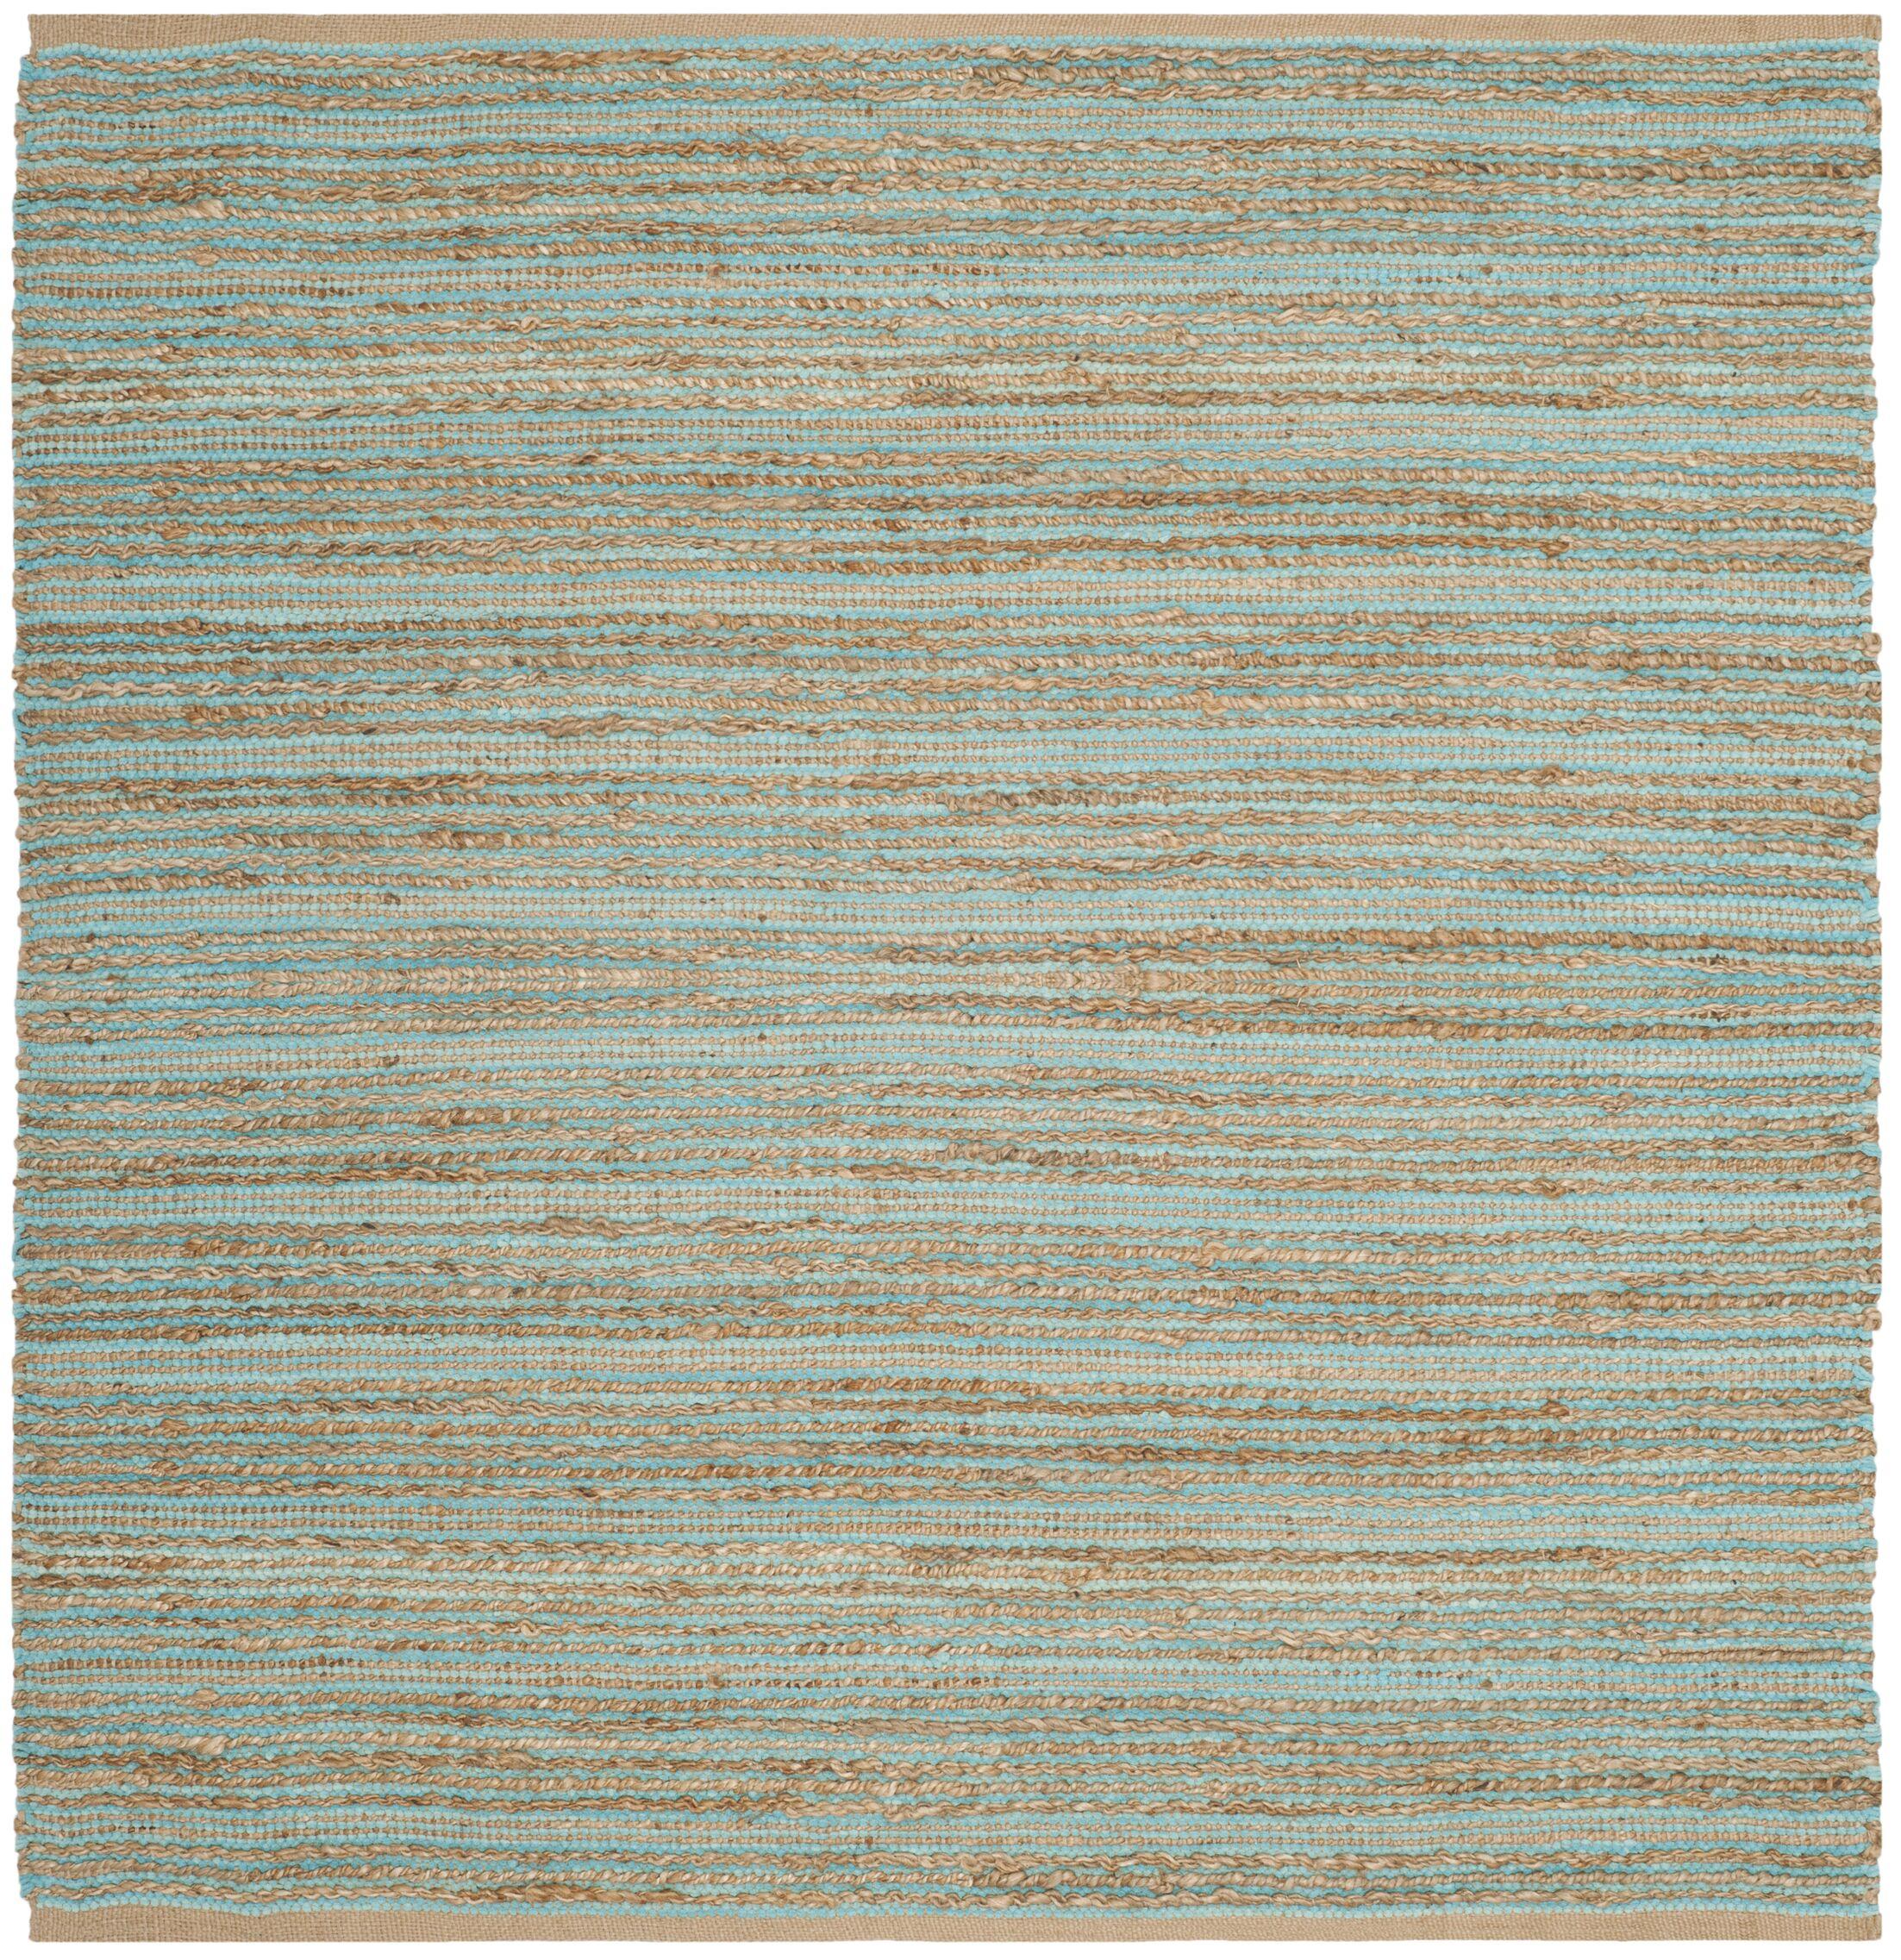 Marshville Hand-Woven Aqua/Beige Area Rug Rug Size: Square 6'